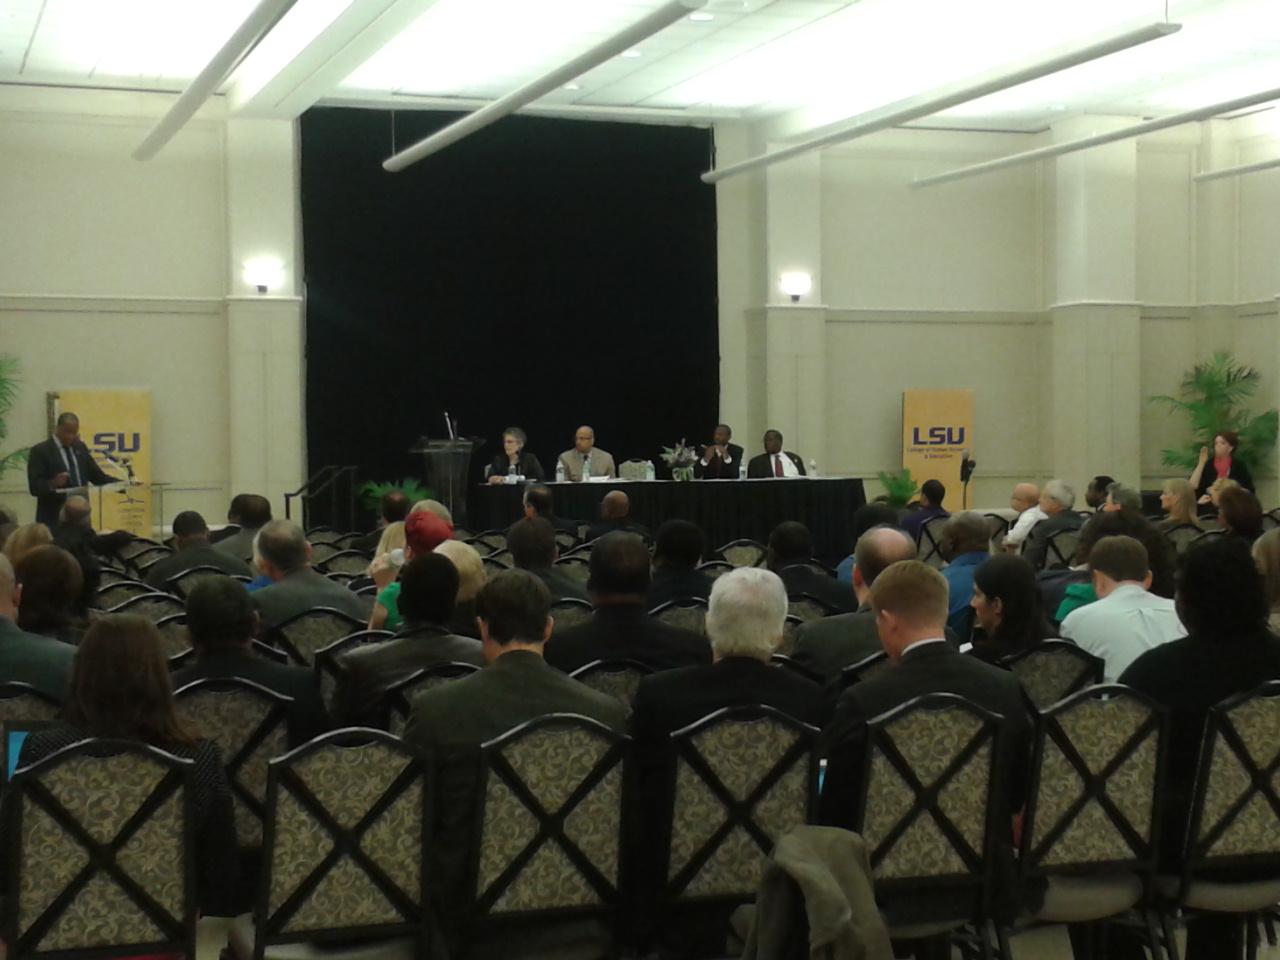 Acting Deputy Secretary of Education Jim Shelton gets feedback during an open forum at Louisiana State University.